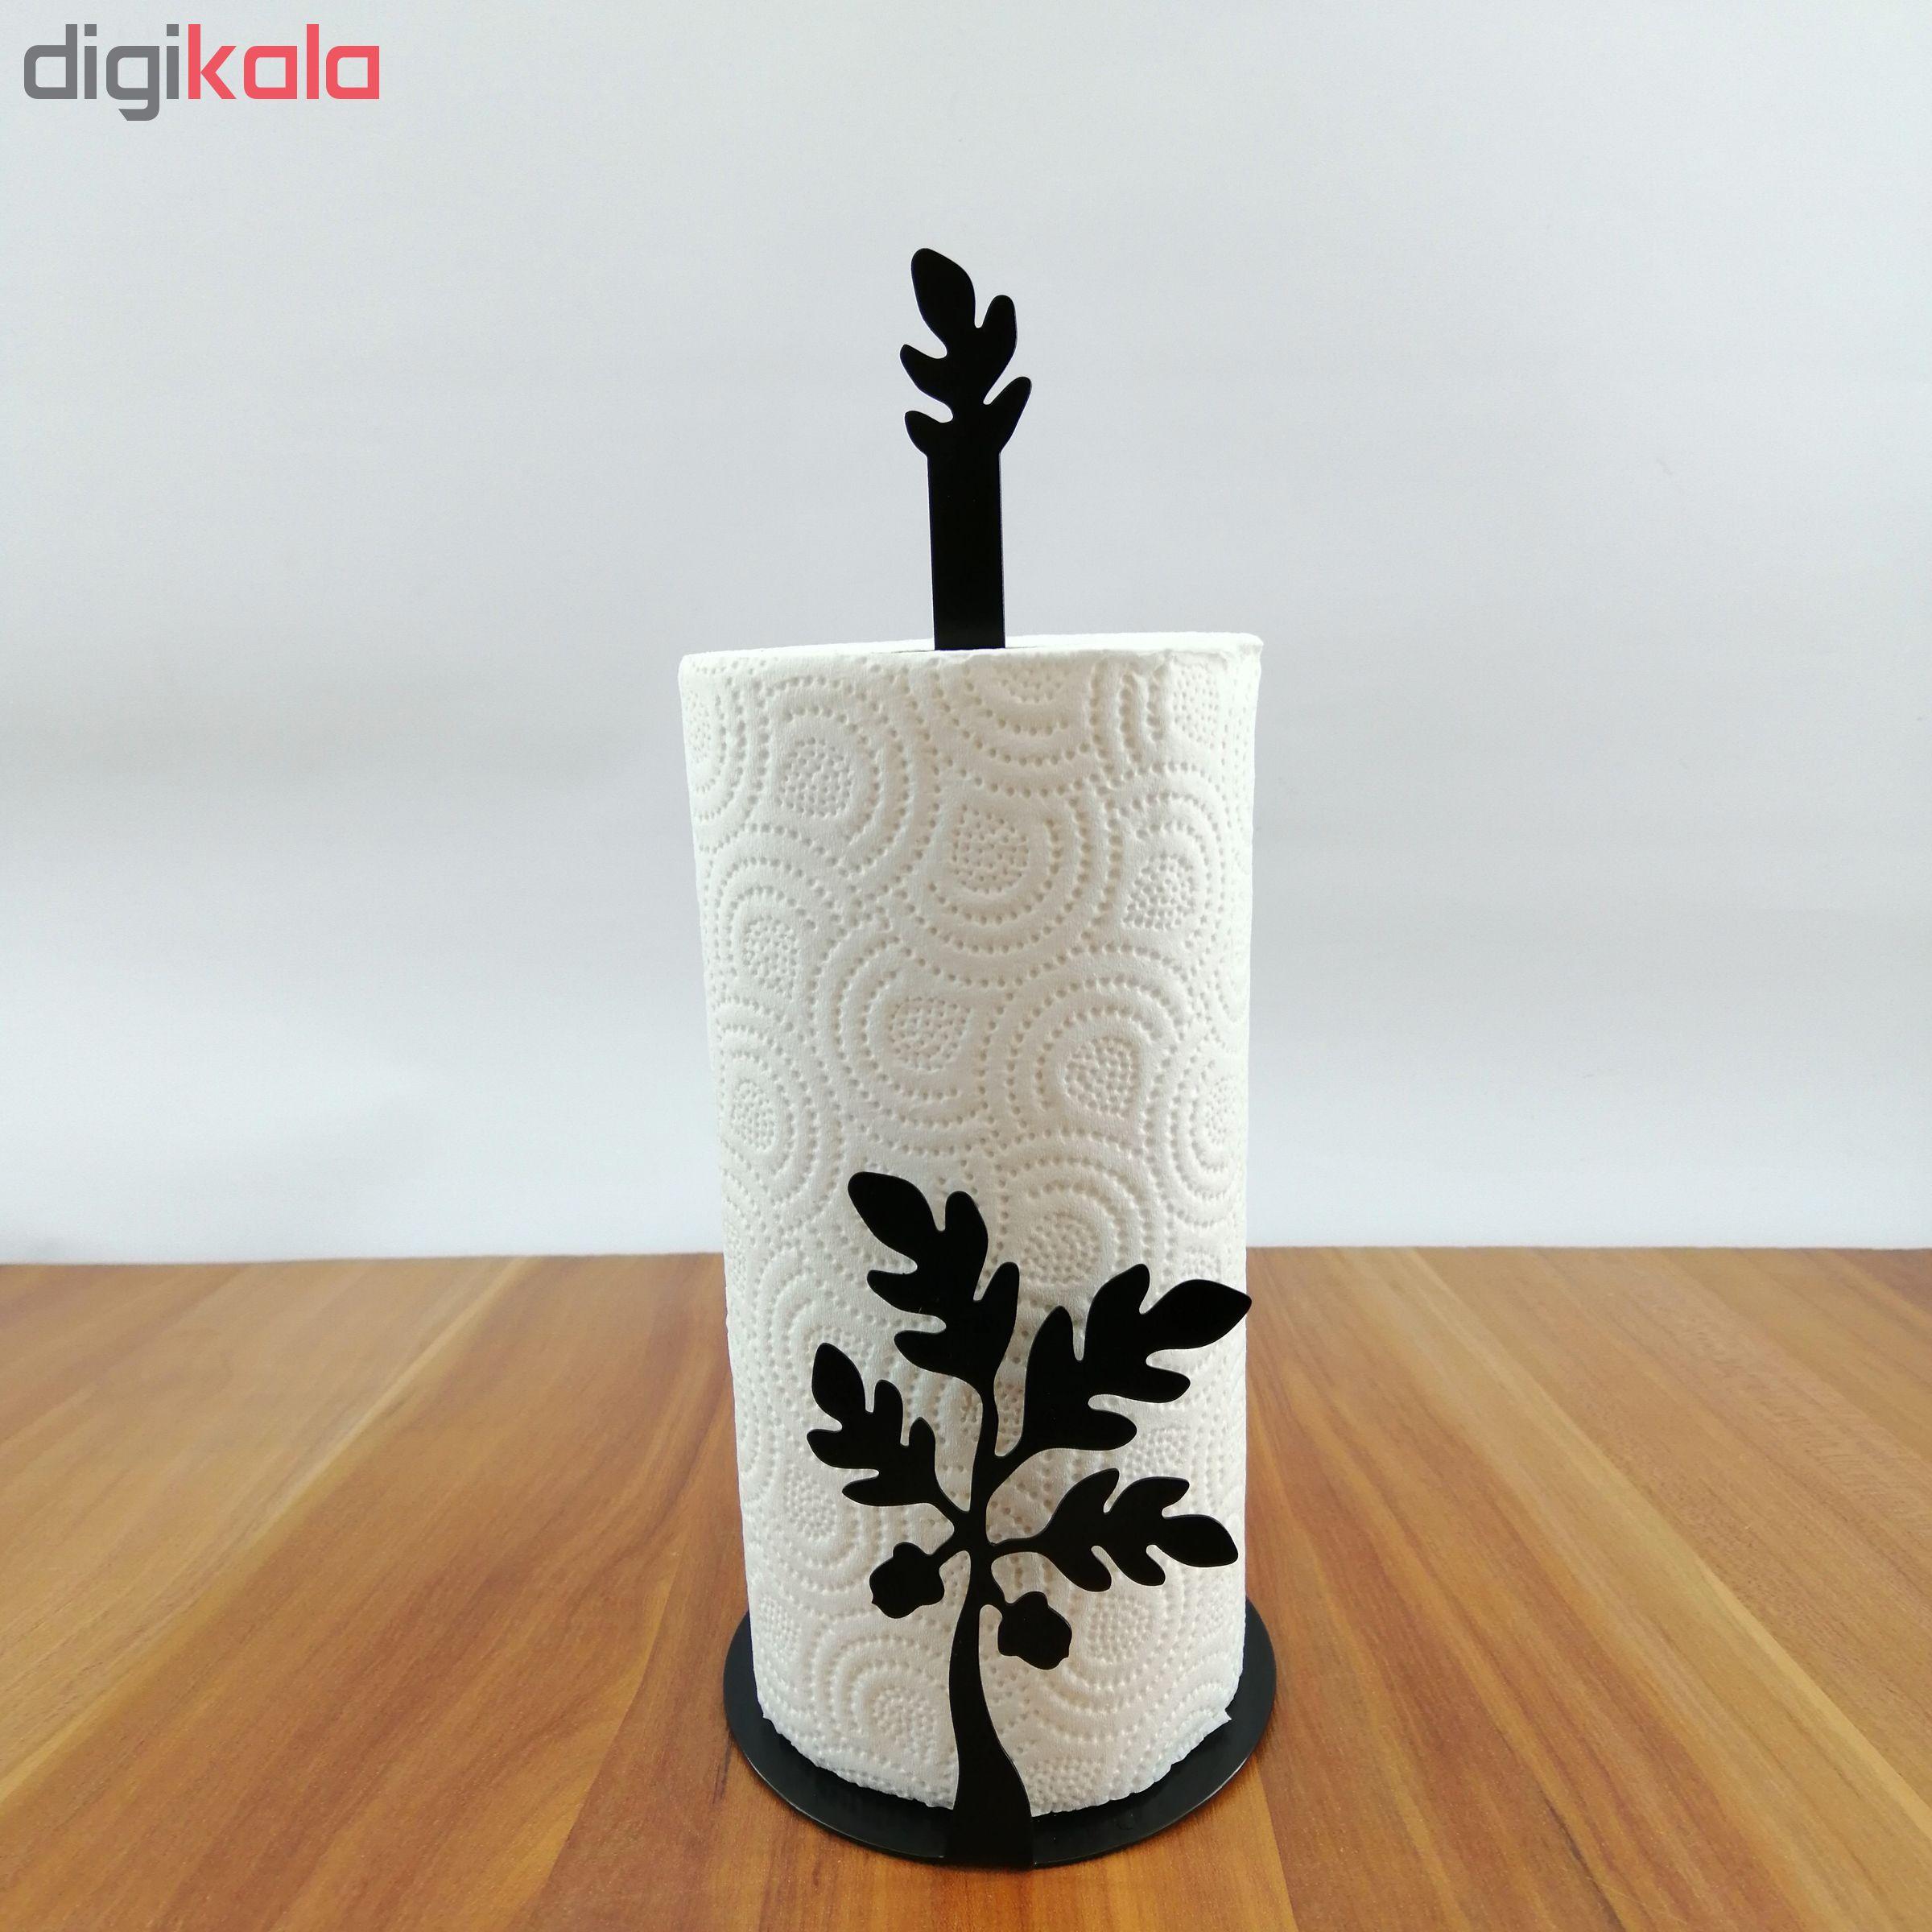 پایه رول دستمال کاغذی ملو طرح برگ بلوط 1 کد KMJ15